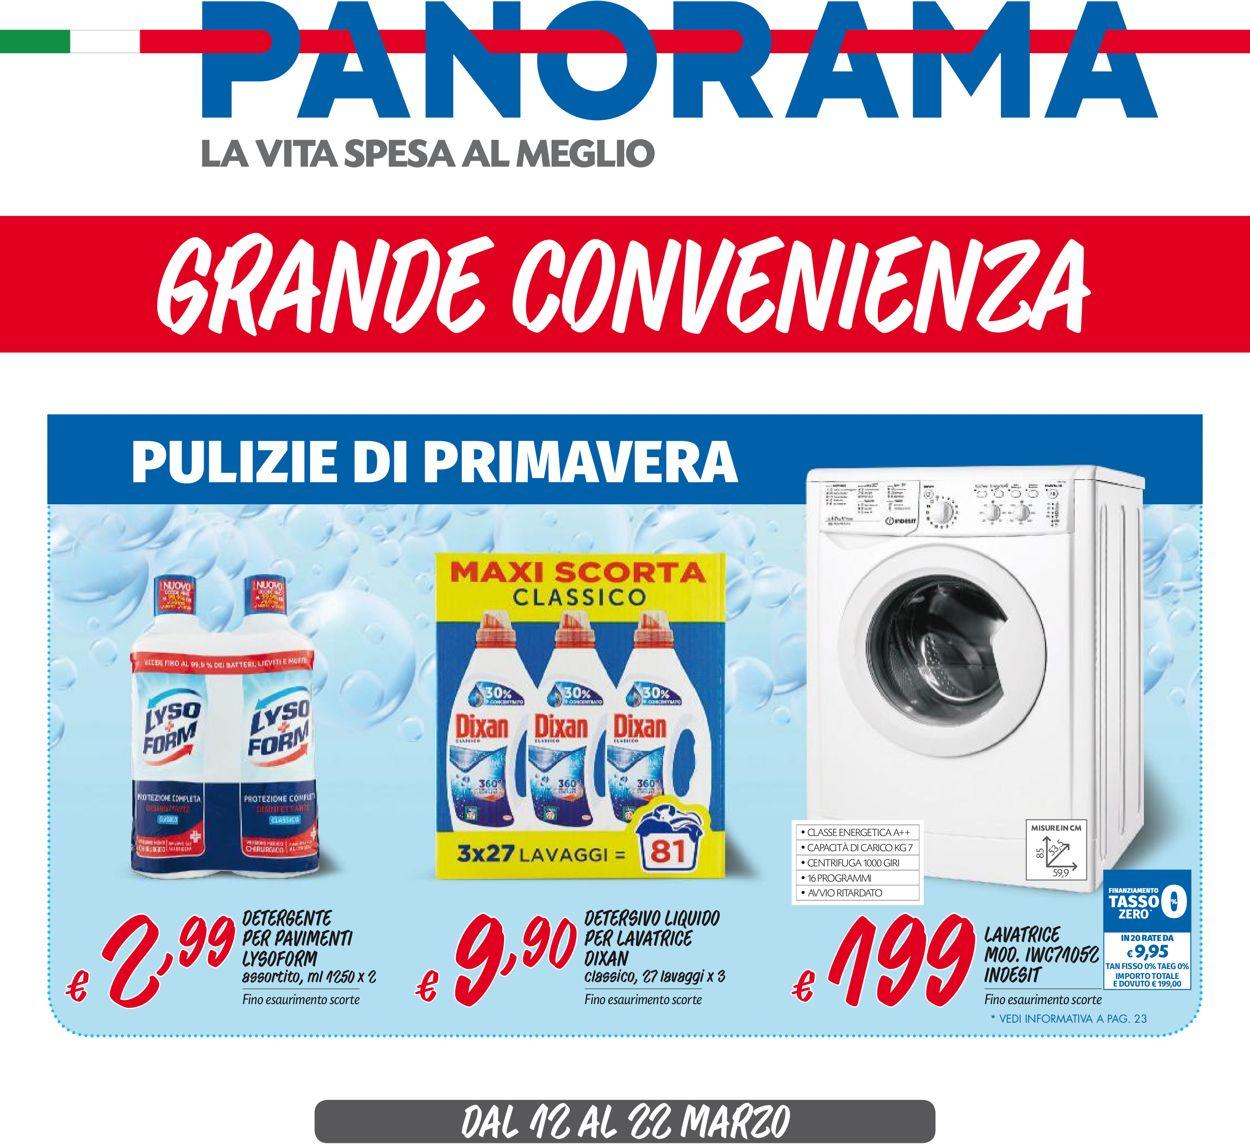 Volantino Pam Panorama - Offerte 12/03-22/03/2020